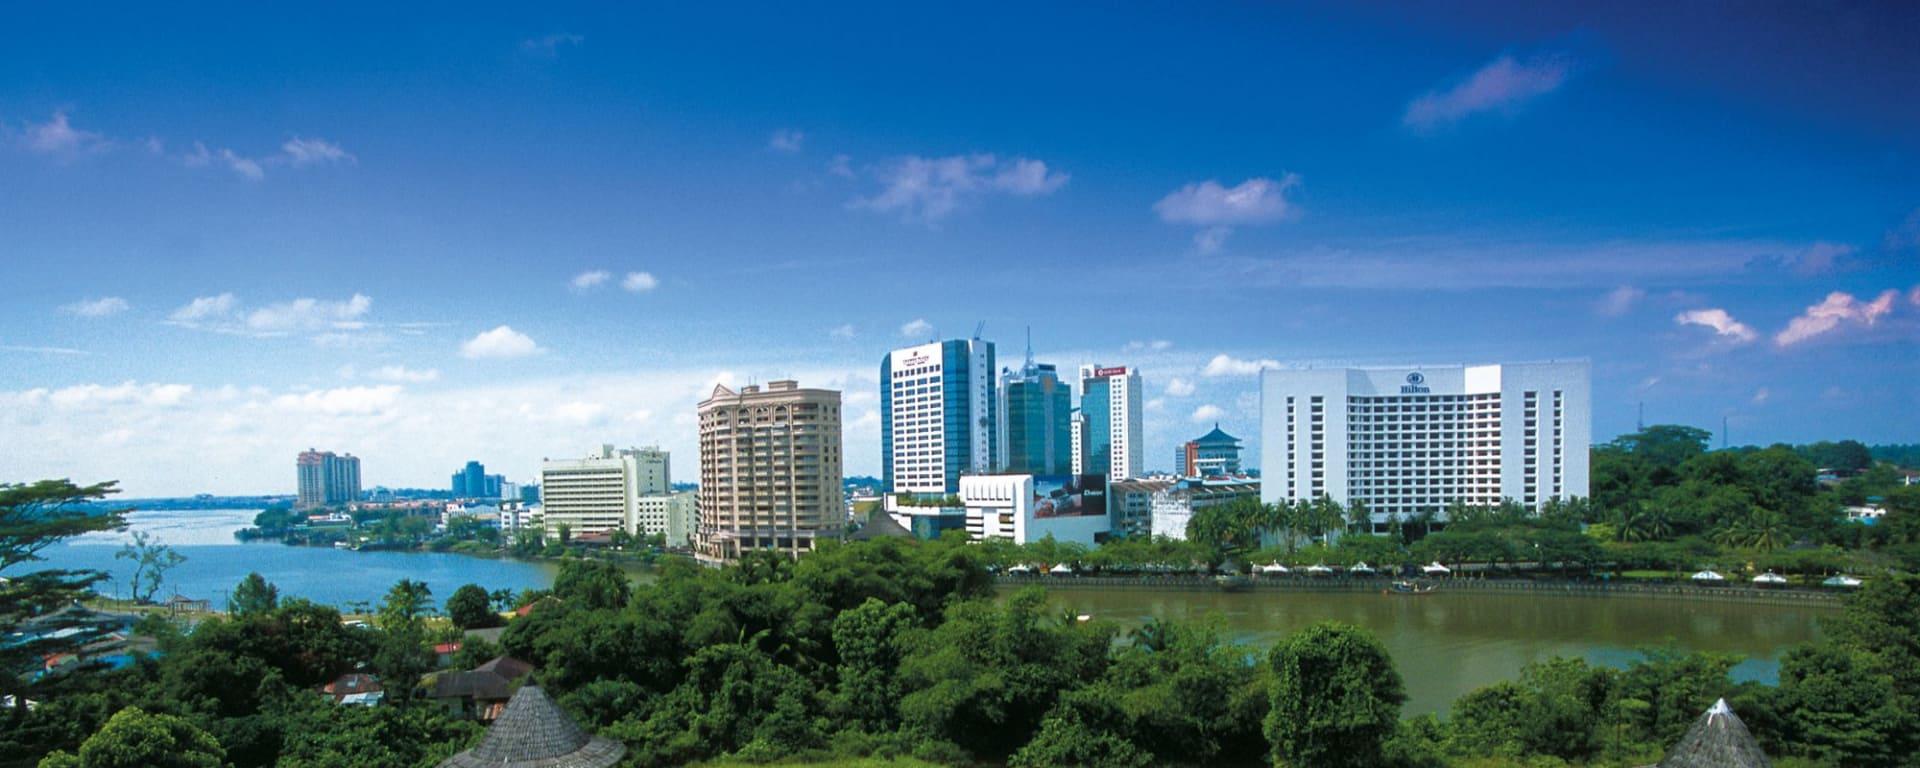 Tour de ville de Kuching: Kuching: Capital of Sarawak